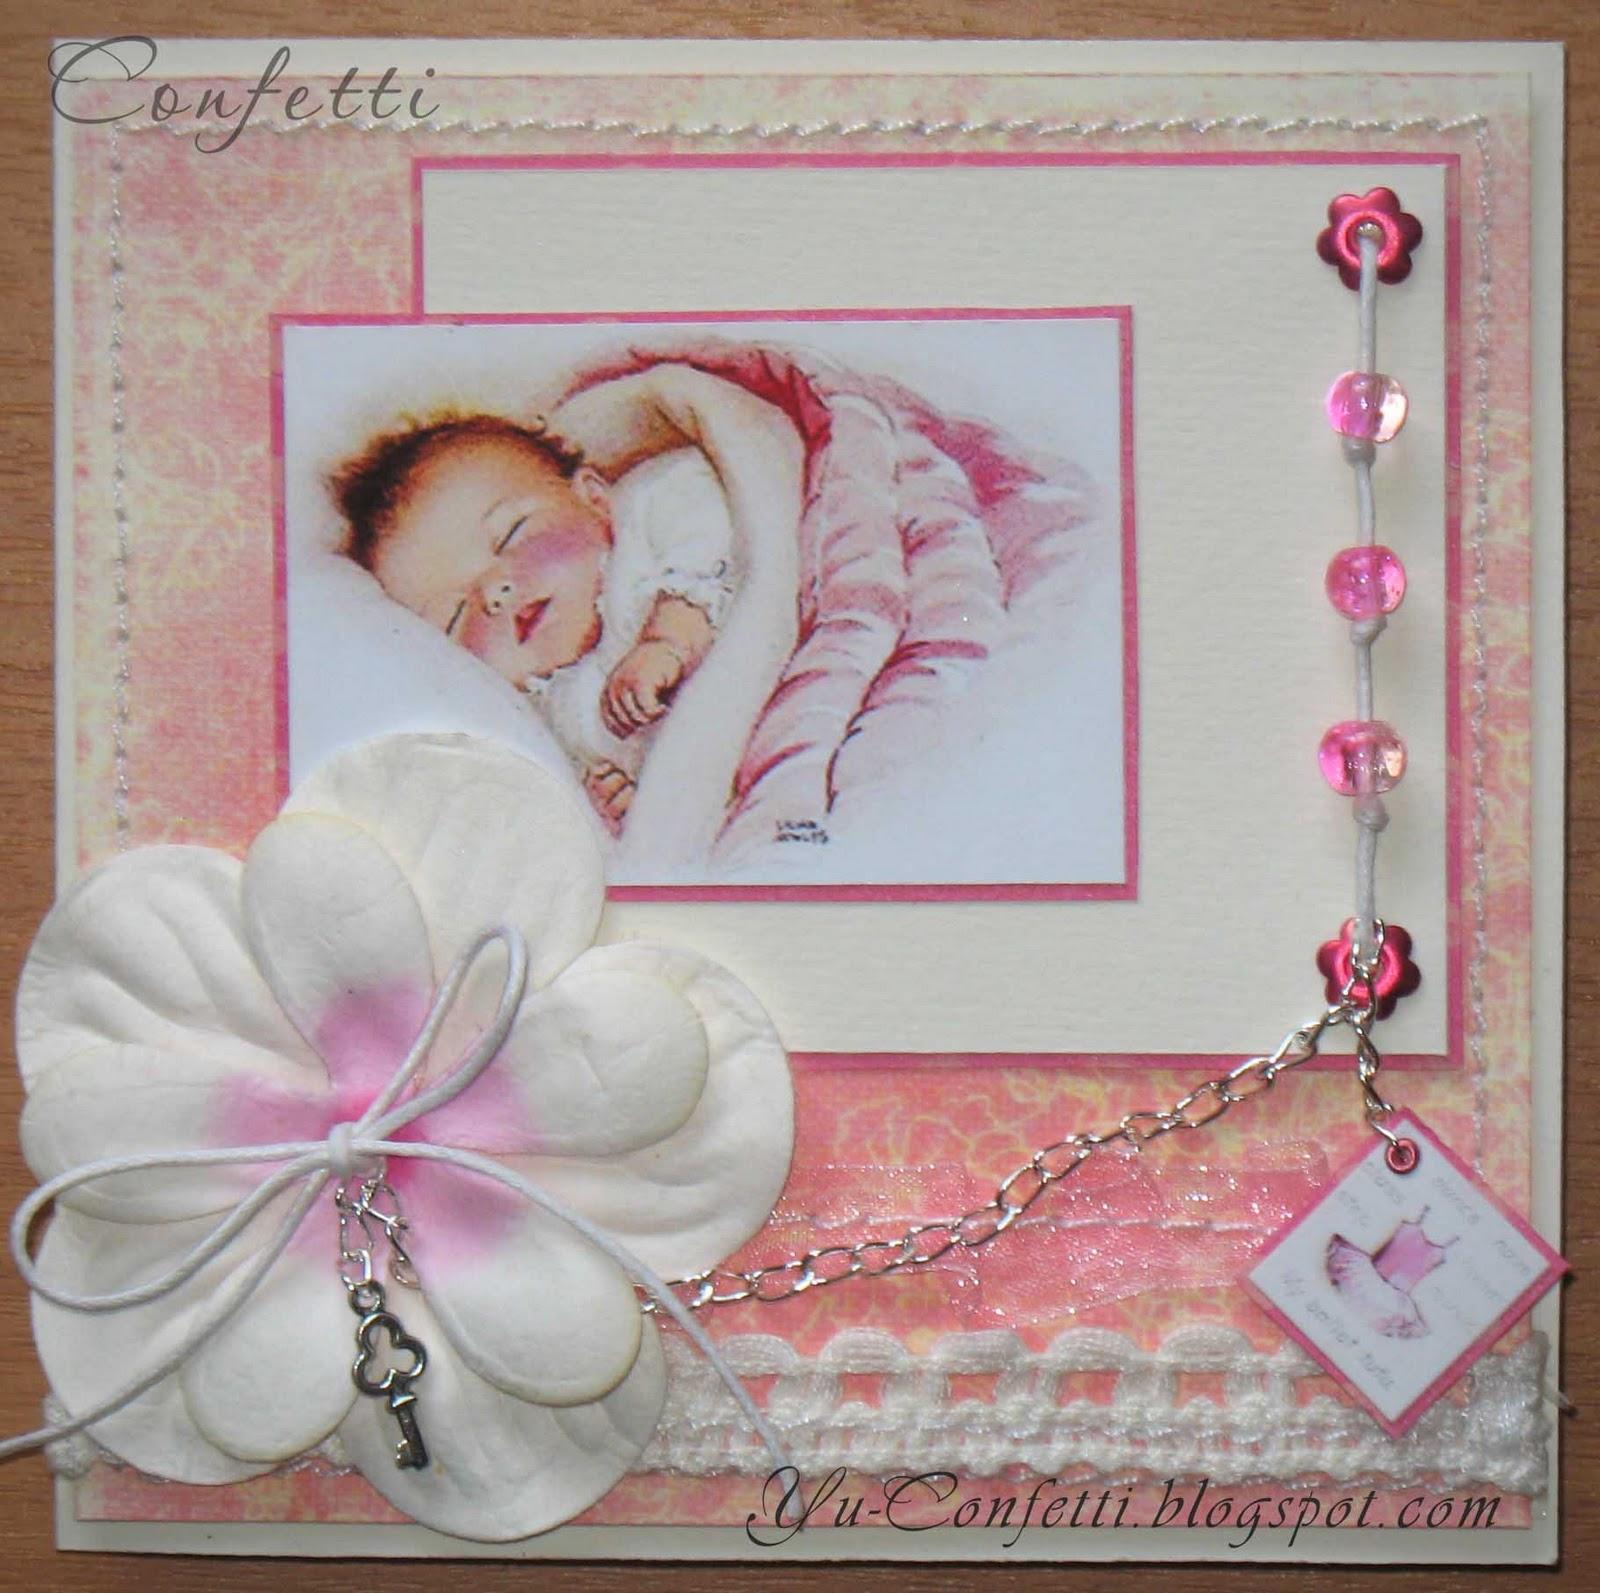 "Confetti : Открытка ""С новорожденной"": yu-confetti.blogspot.com/2011/12/blog-post_8278.html"